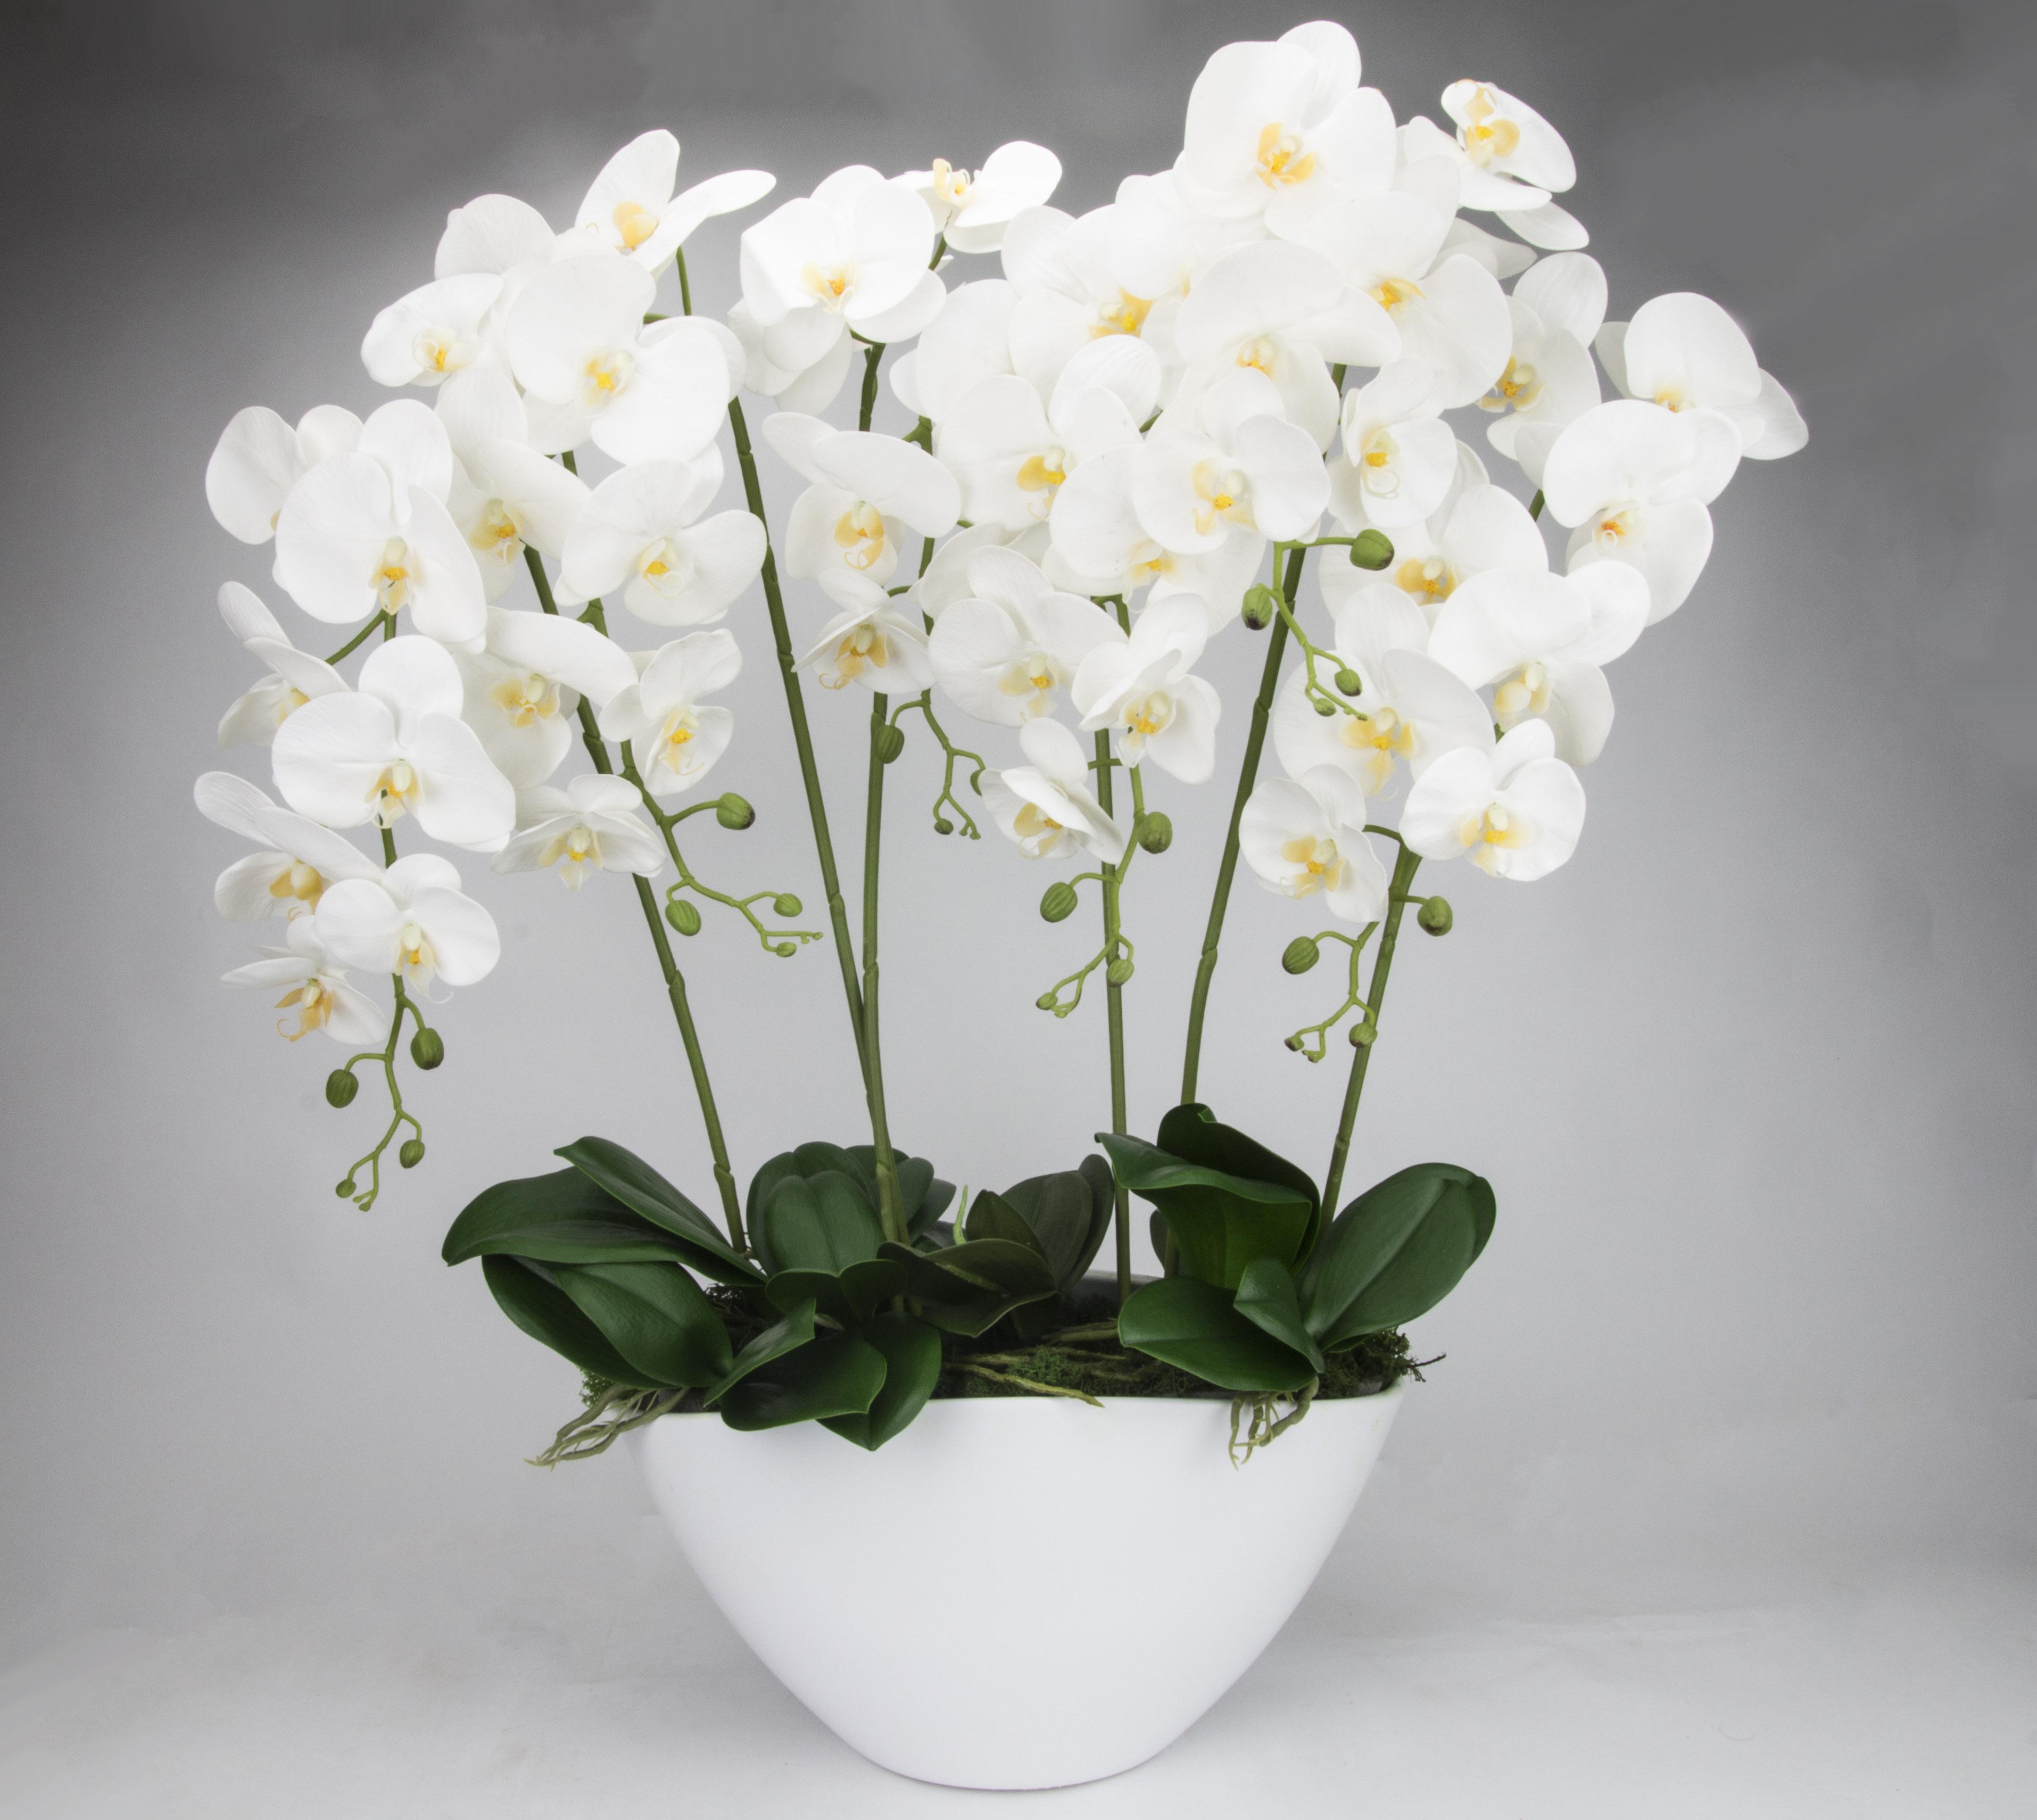 k nstliche orchideen xxl gro kunstblumen bertopf. Black Bedroom Furniture Sets. Home Design Ideas